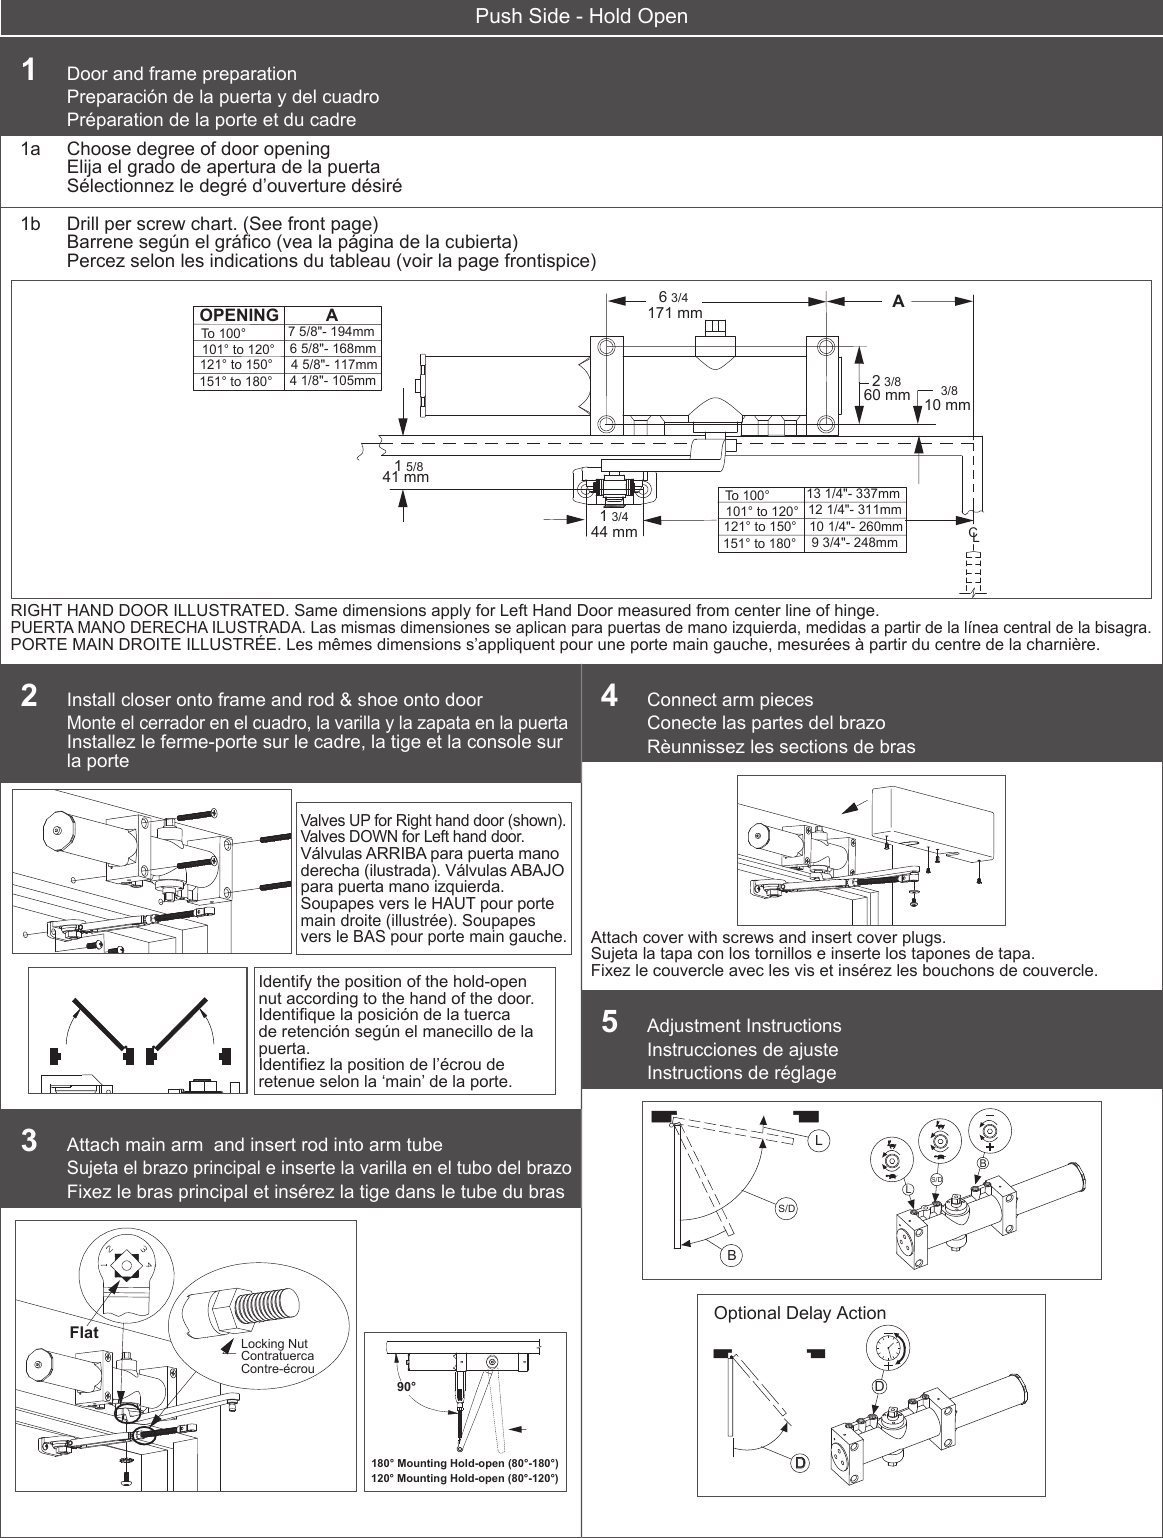 Dexter Falcon Dch1000 Series Door Closer Hold Open S Manual Guide